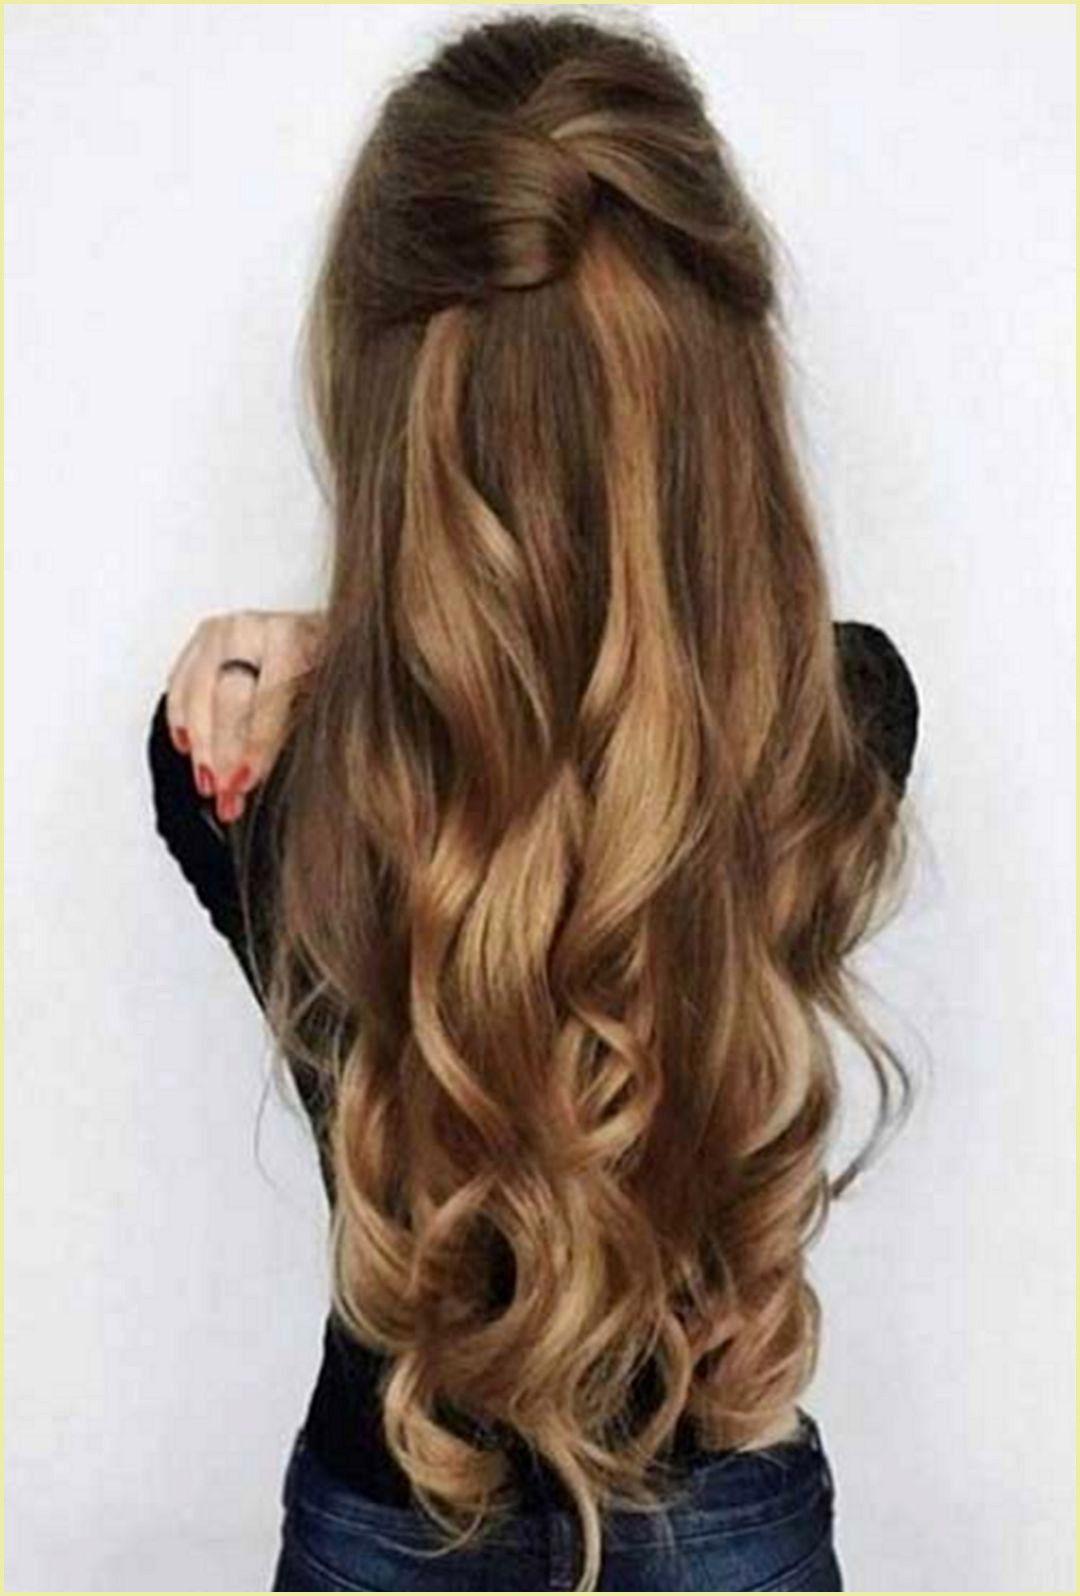 Hairstyles Mittellang Halboffen Festival Frisuren Boho Halboffen Fur Mittellange Haare Frisuren Frisuren Lange Haare Anleitung Festliche Frisuren Halblange Haare